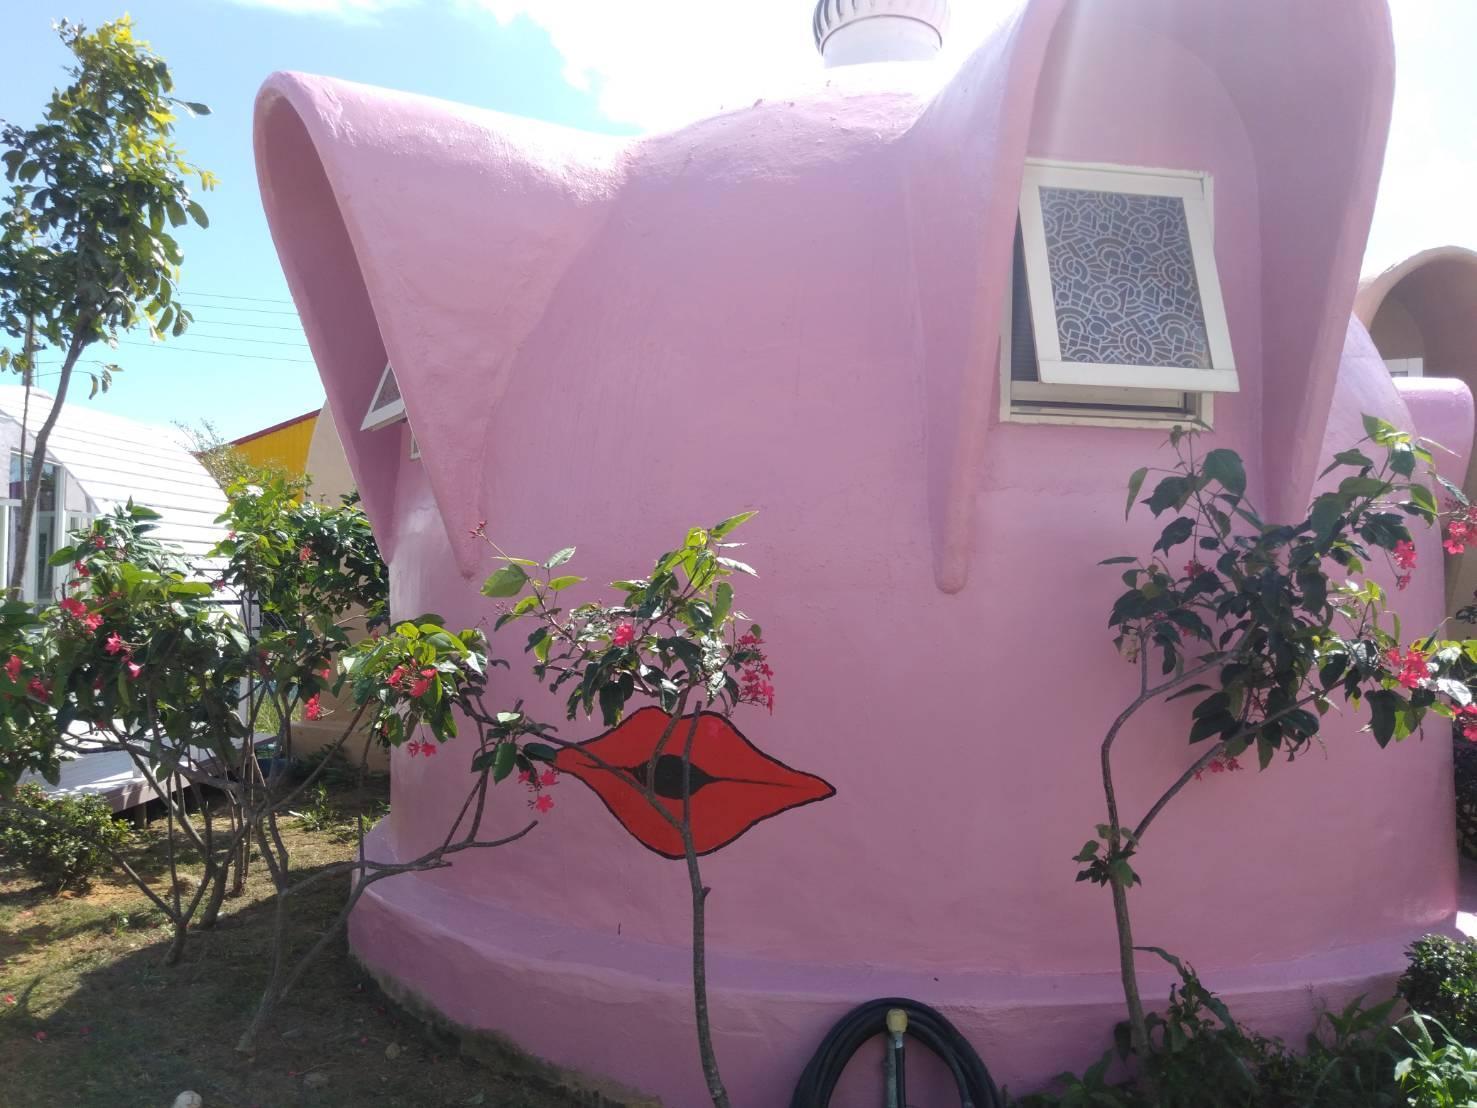 HI BI Outer Space House BnB